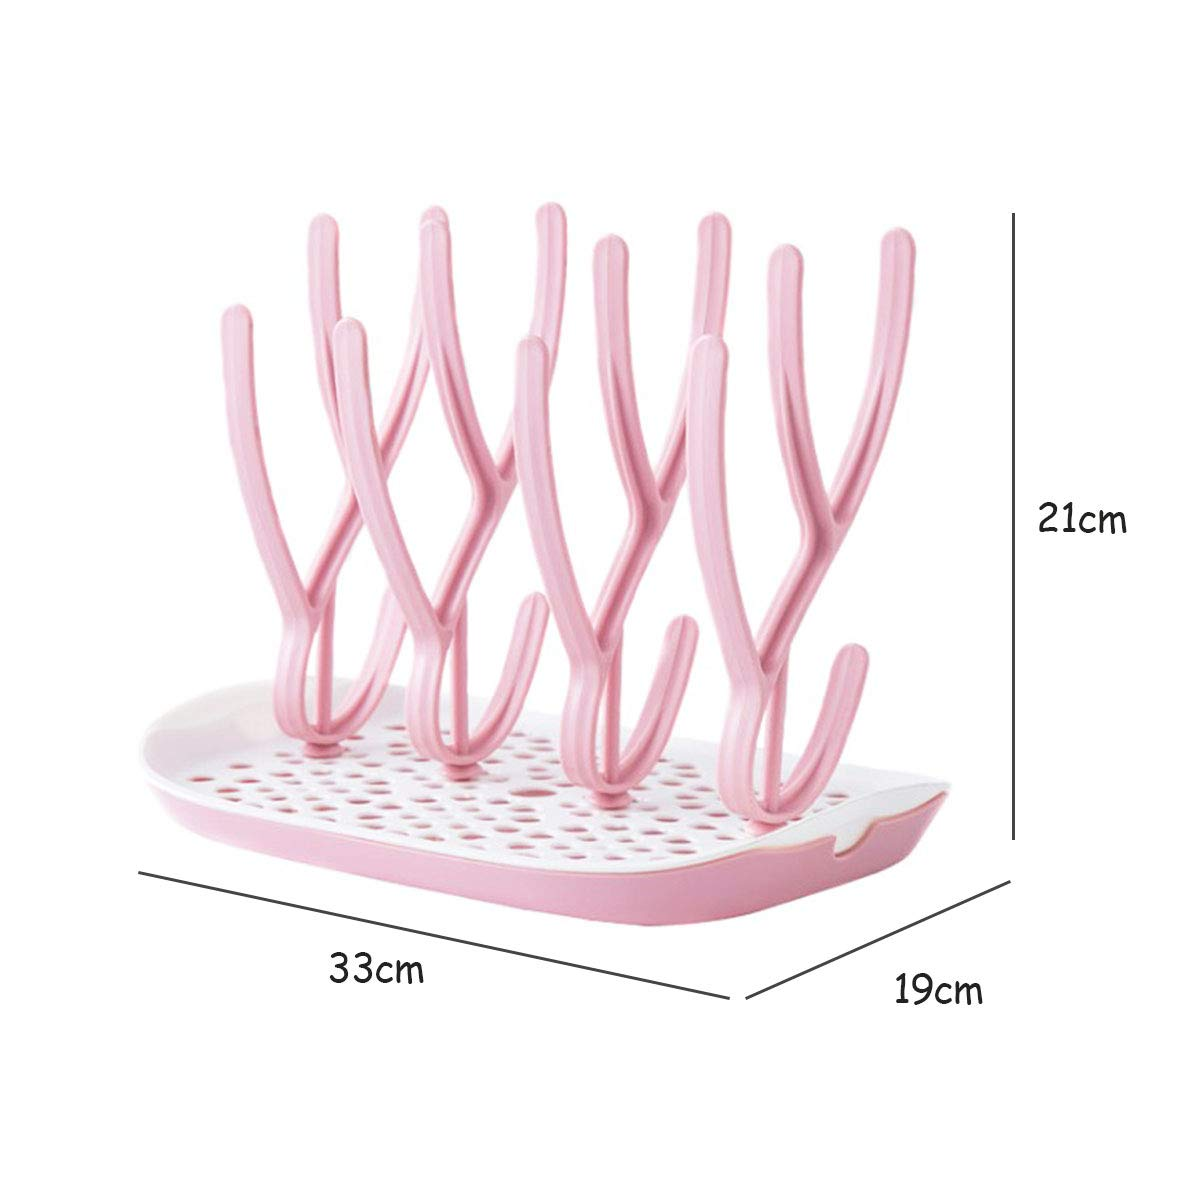 TANGGER Rosa Escurridor de Biberones /& Conjunto de 7 piezas Cepillos para Biberones Escurre Biberon,Libre de BPA